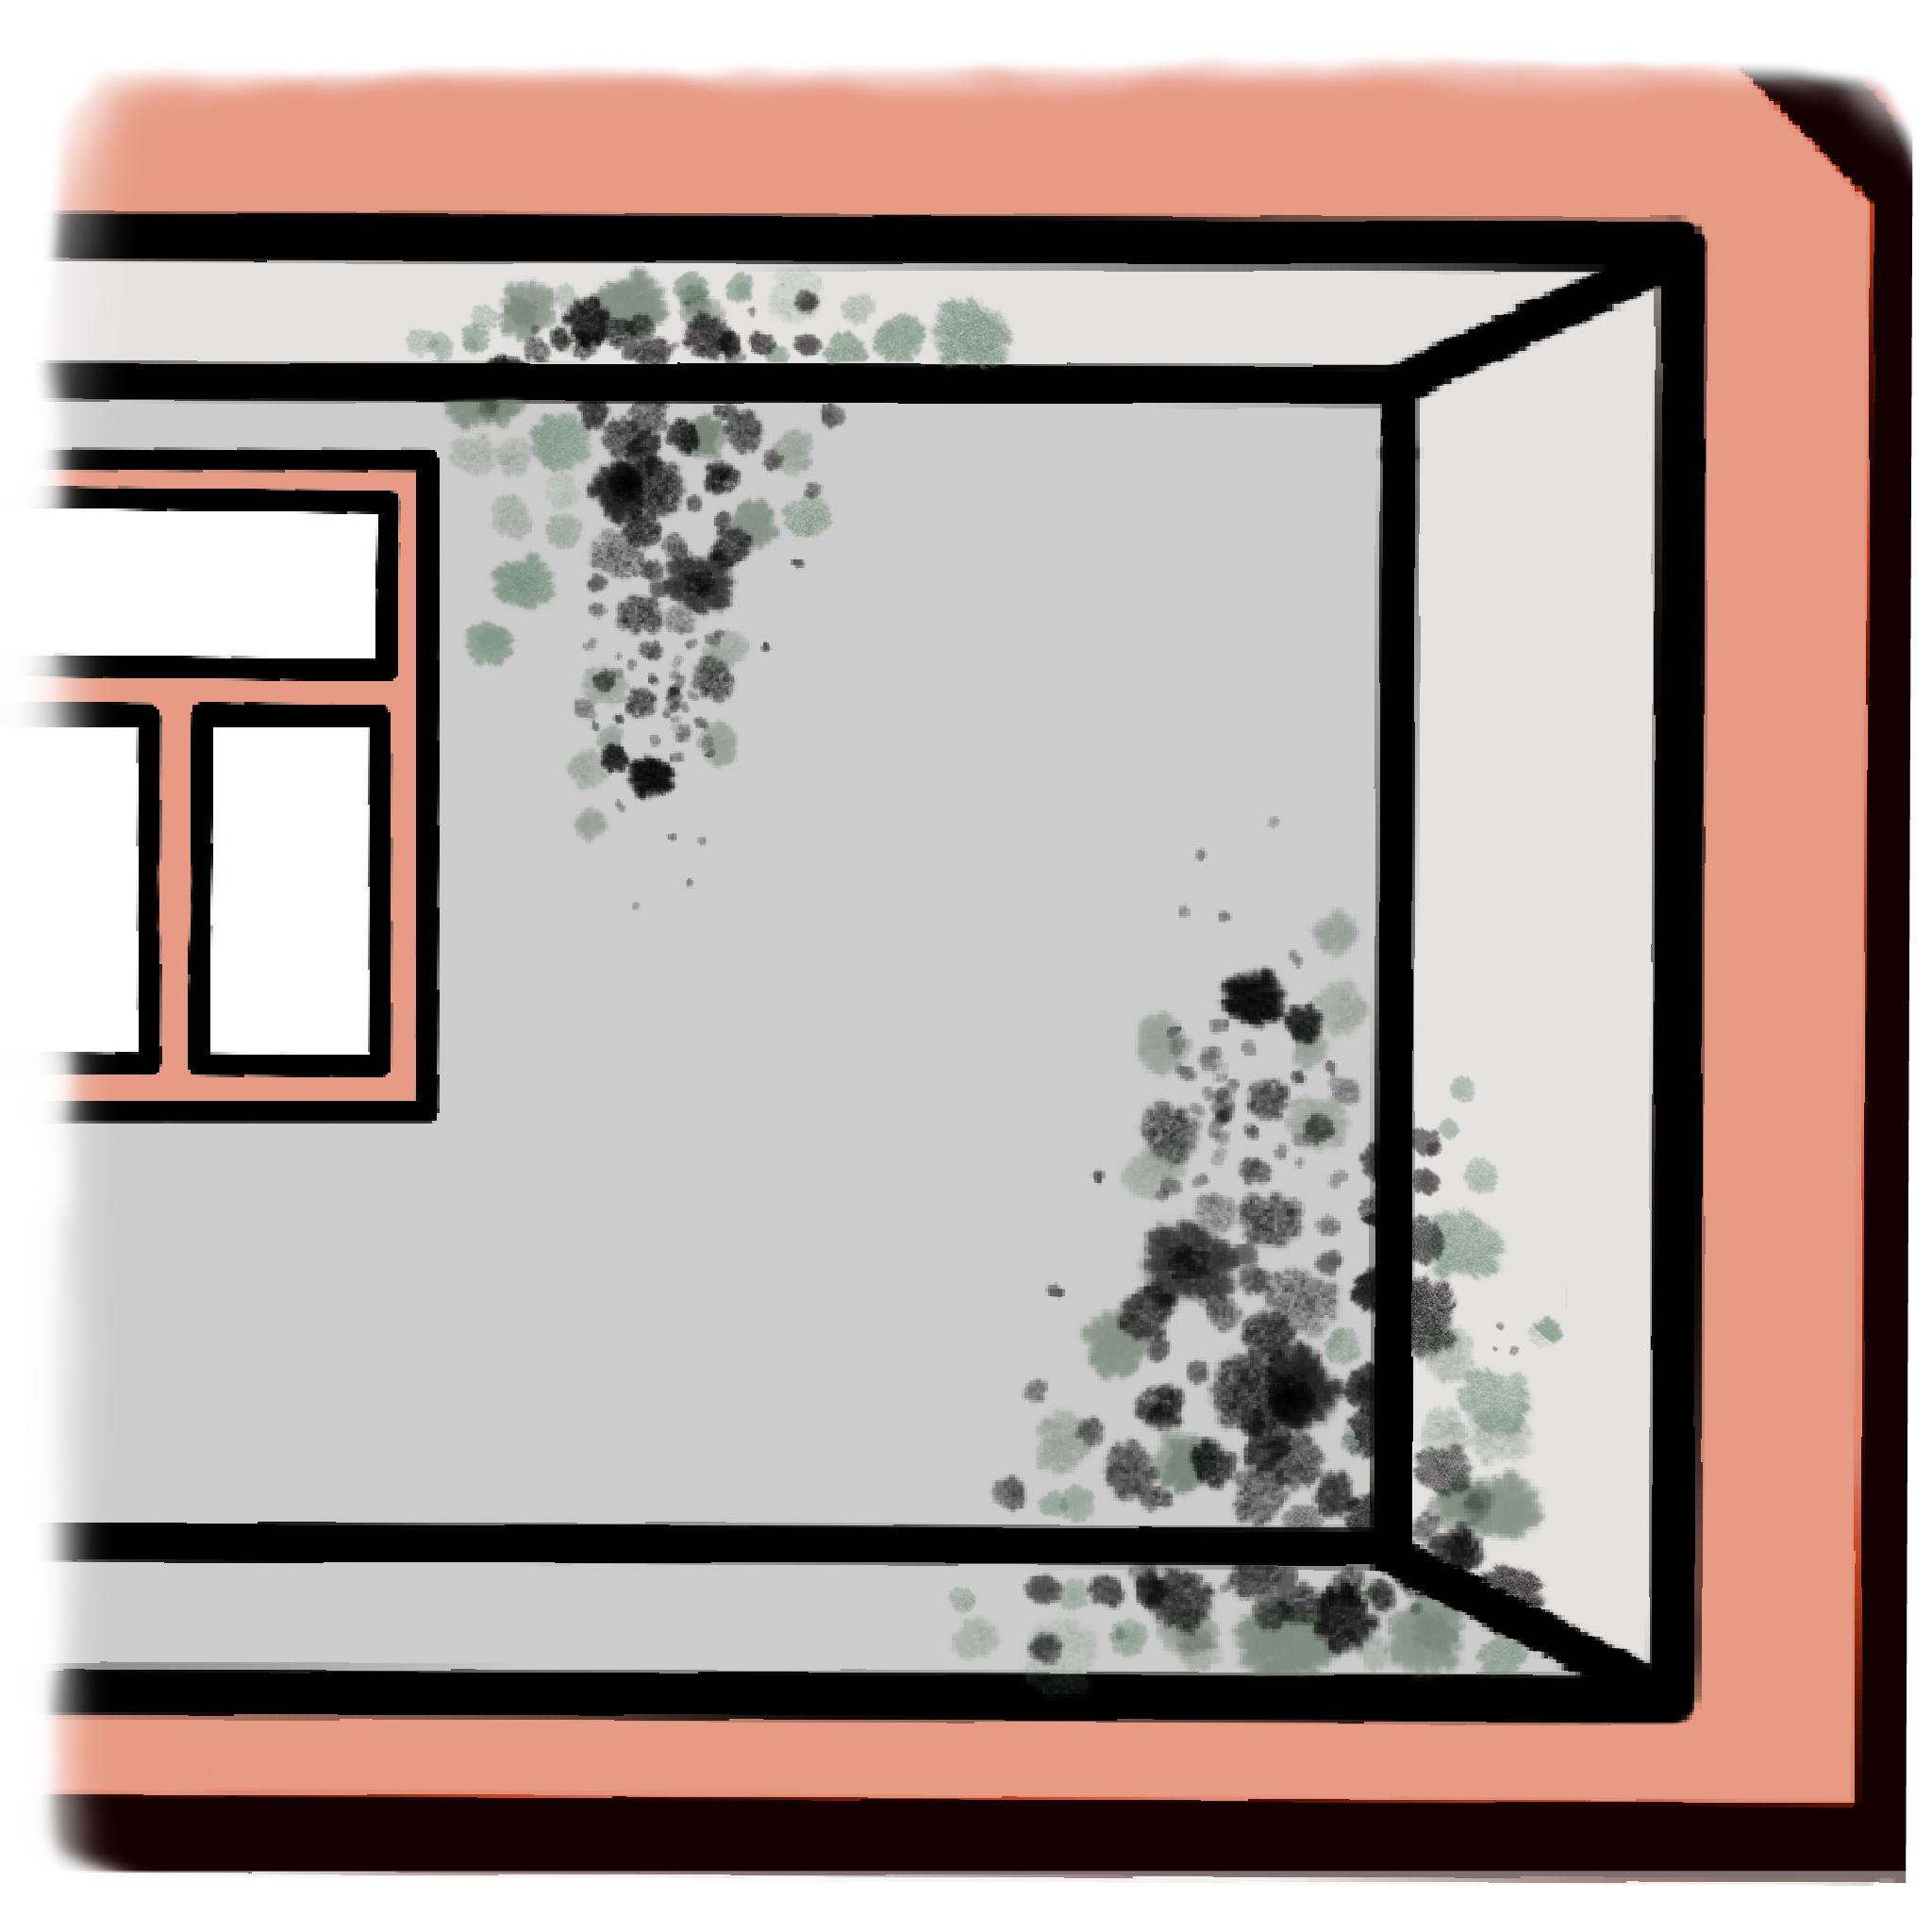 Flecken an Wand, Boden und/oder Decke